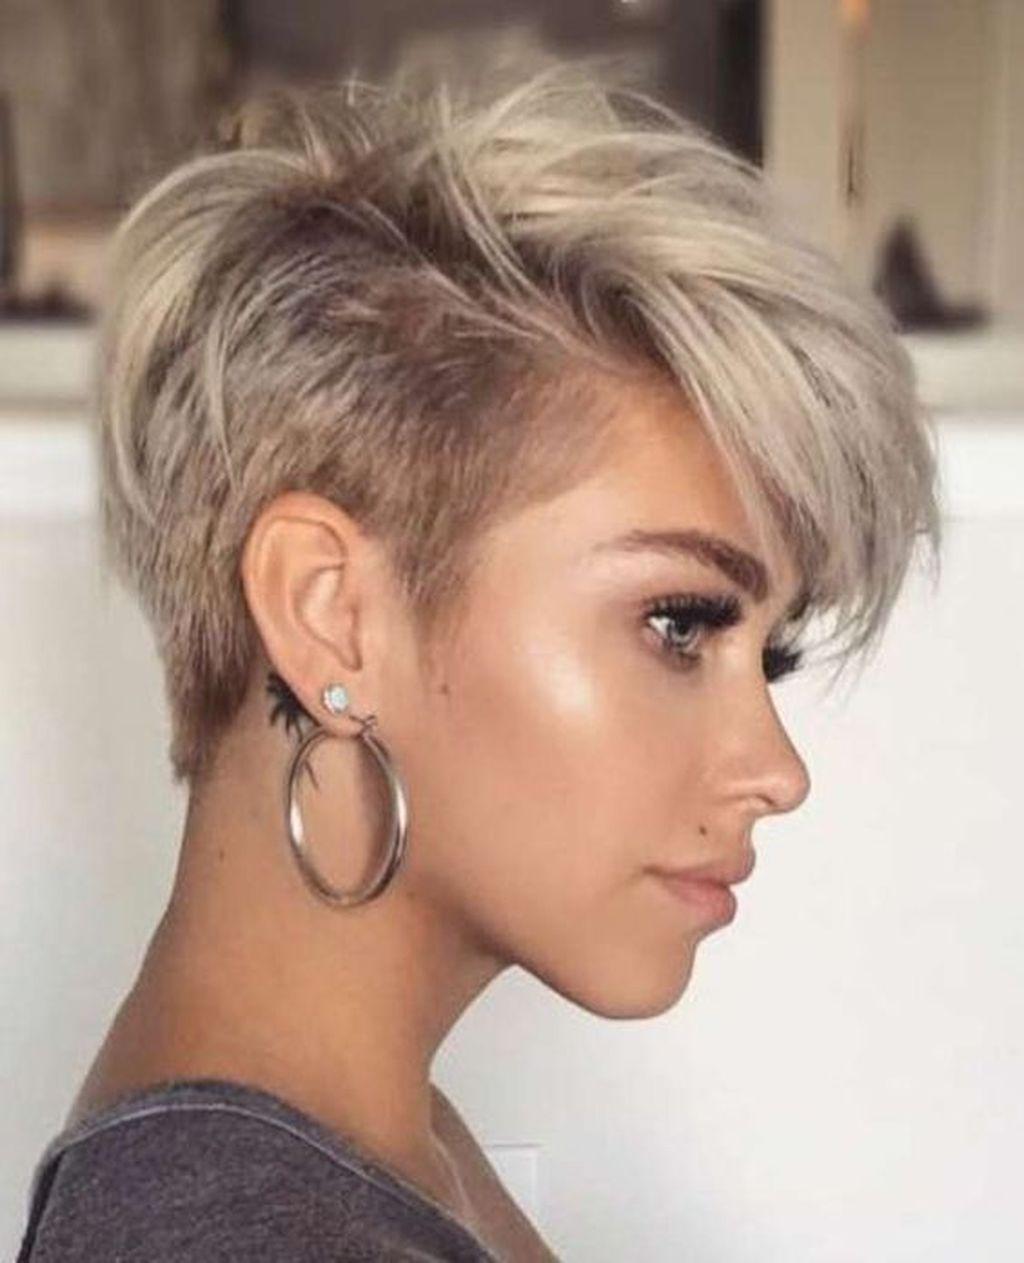 30 Lovely Short Hairstyles Women Ideas Kapsels Kapsels Voor Kort Haar Kort Haar Kapsels